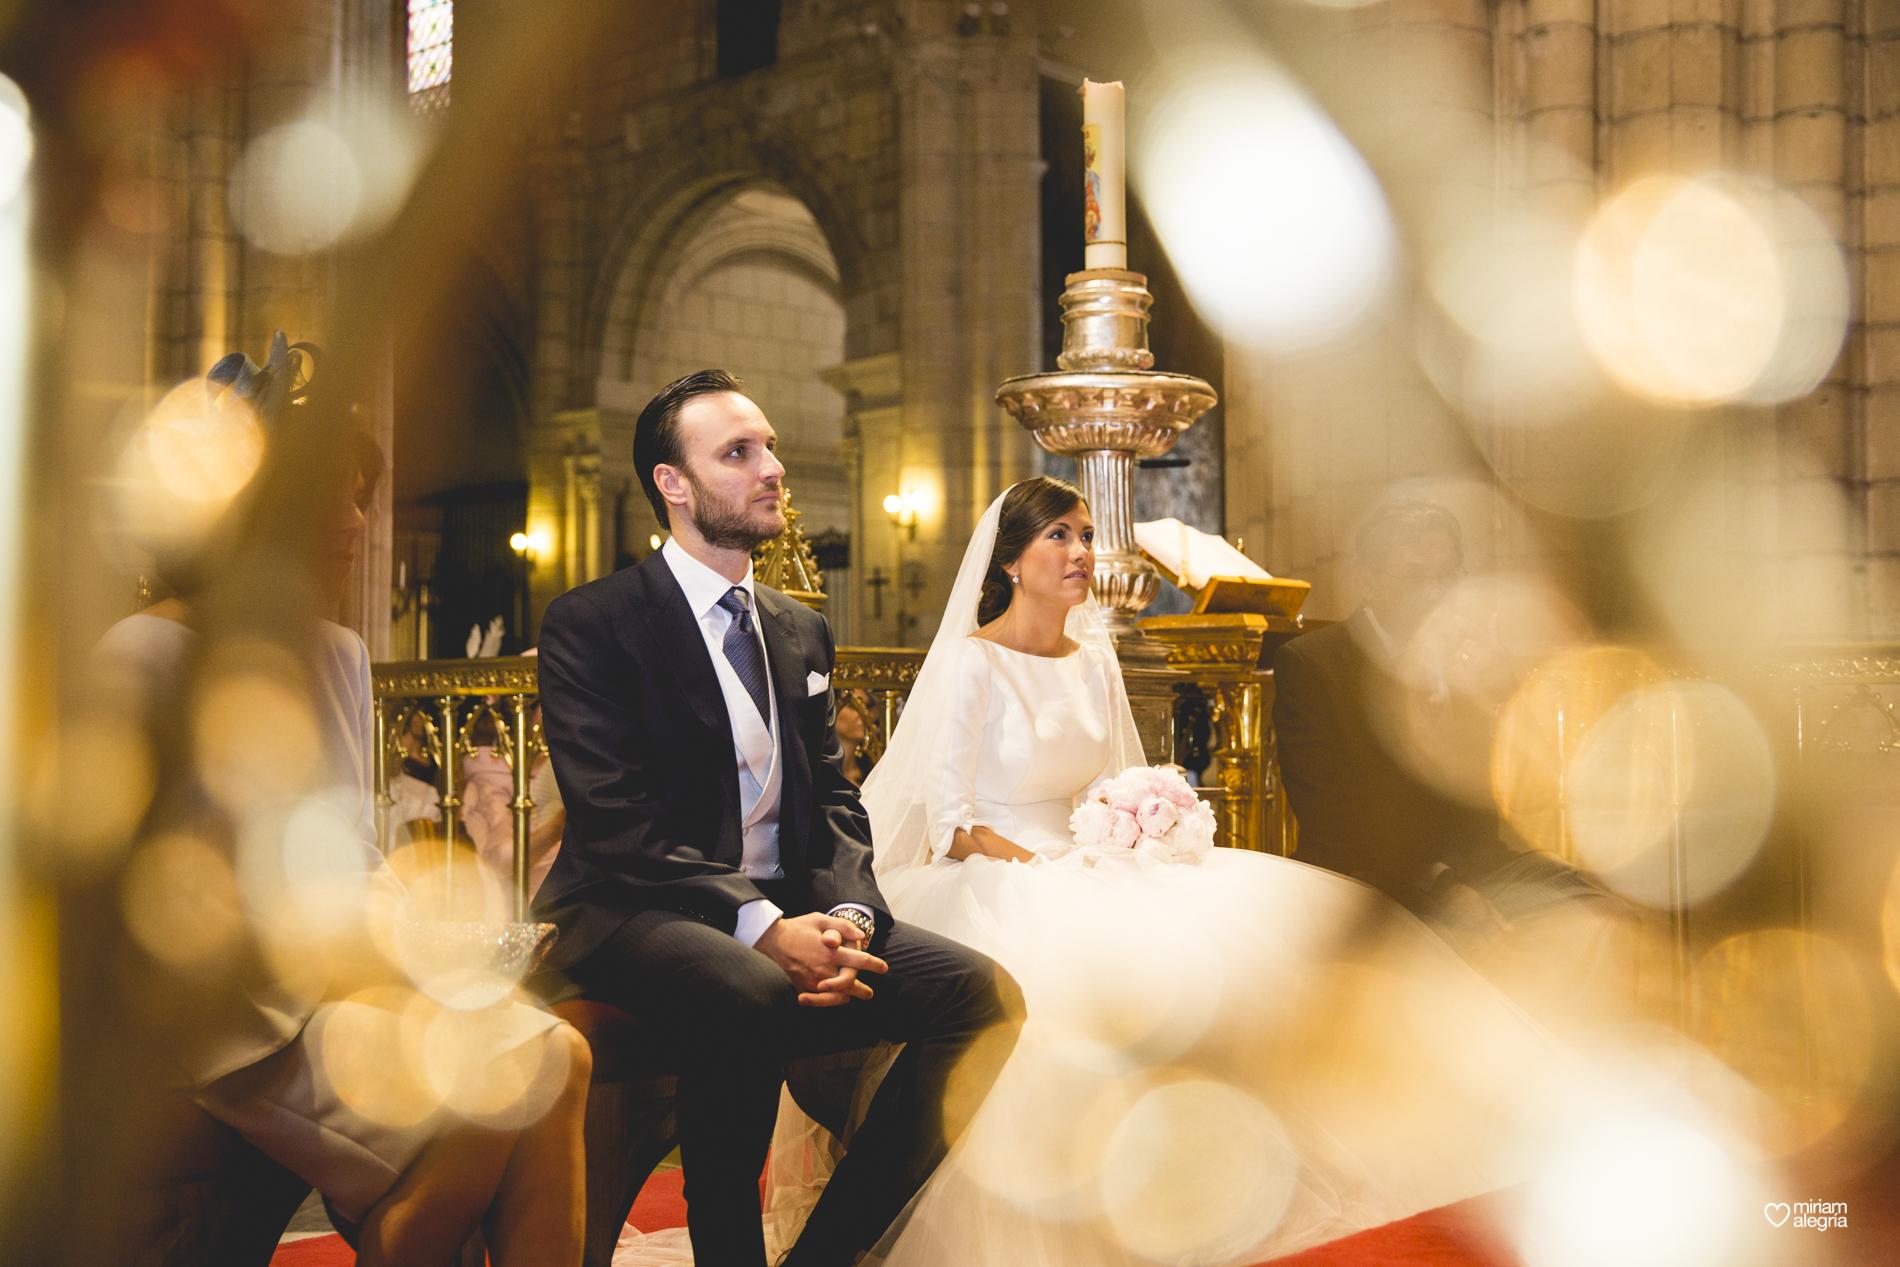 boda-en-la-catedral-de-murcia-miriam-alegria-fotografos-boda-murcia-40